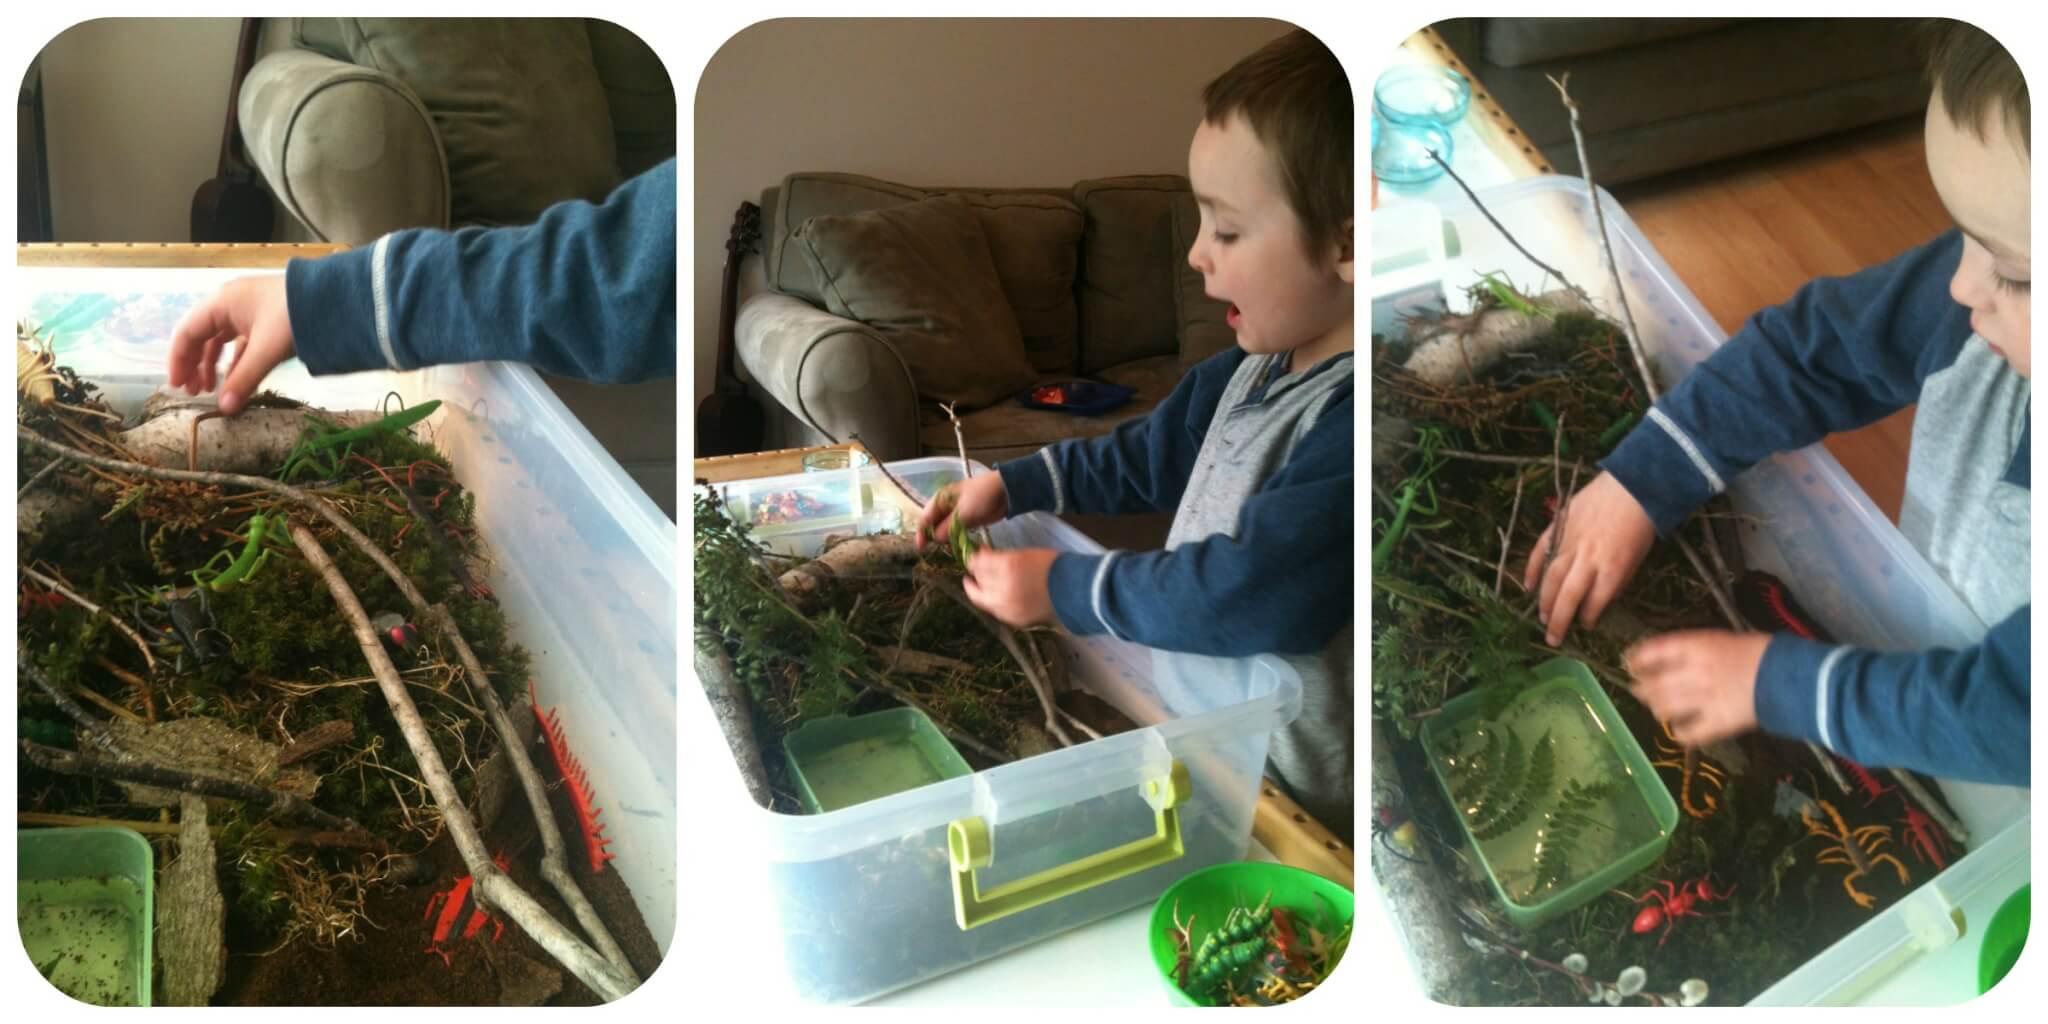 nature sensory bin play 1. Nature Sensory Bin Preschool Outdoor Activity